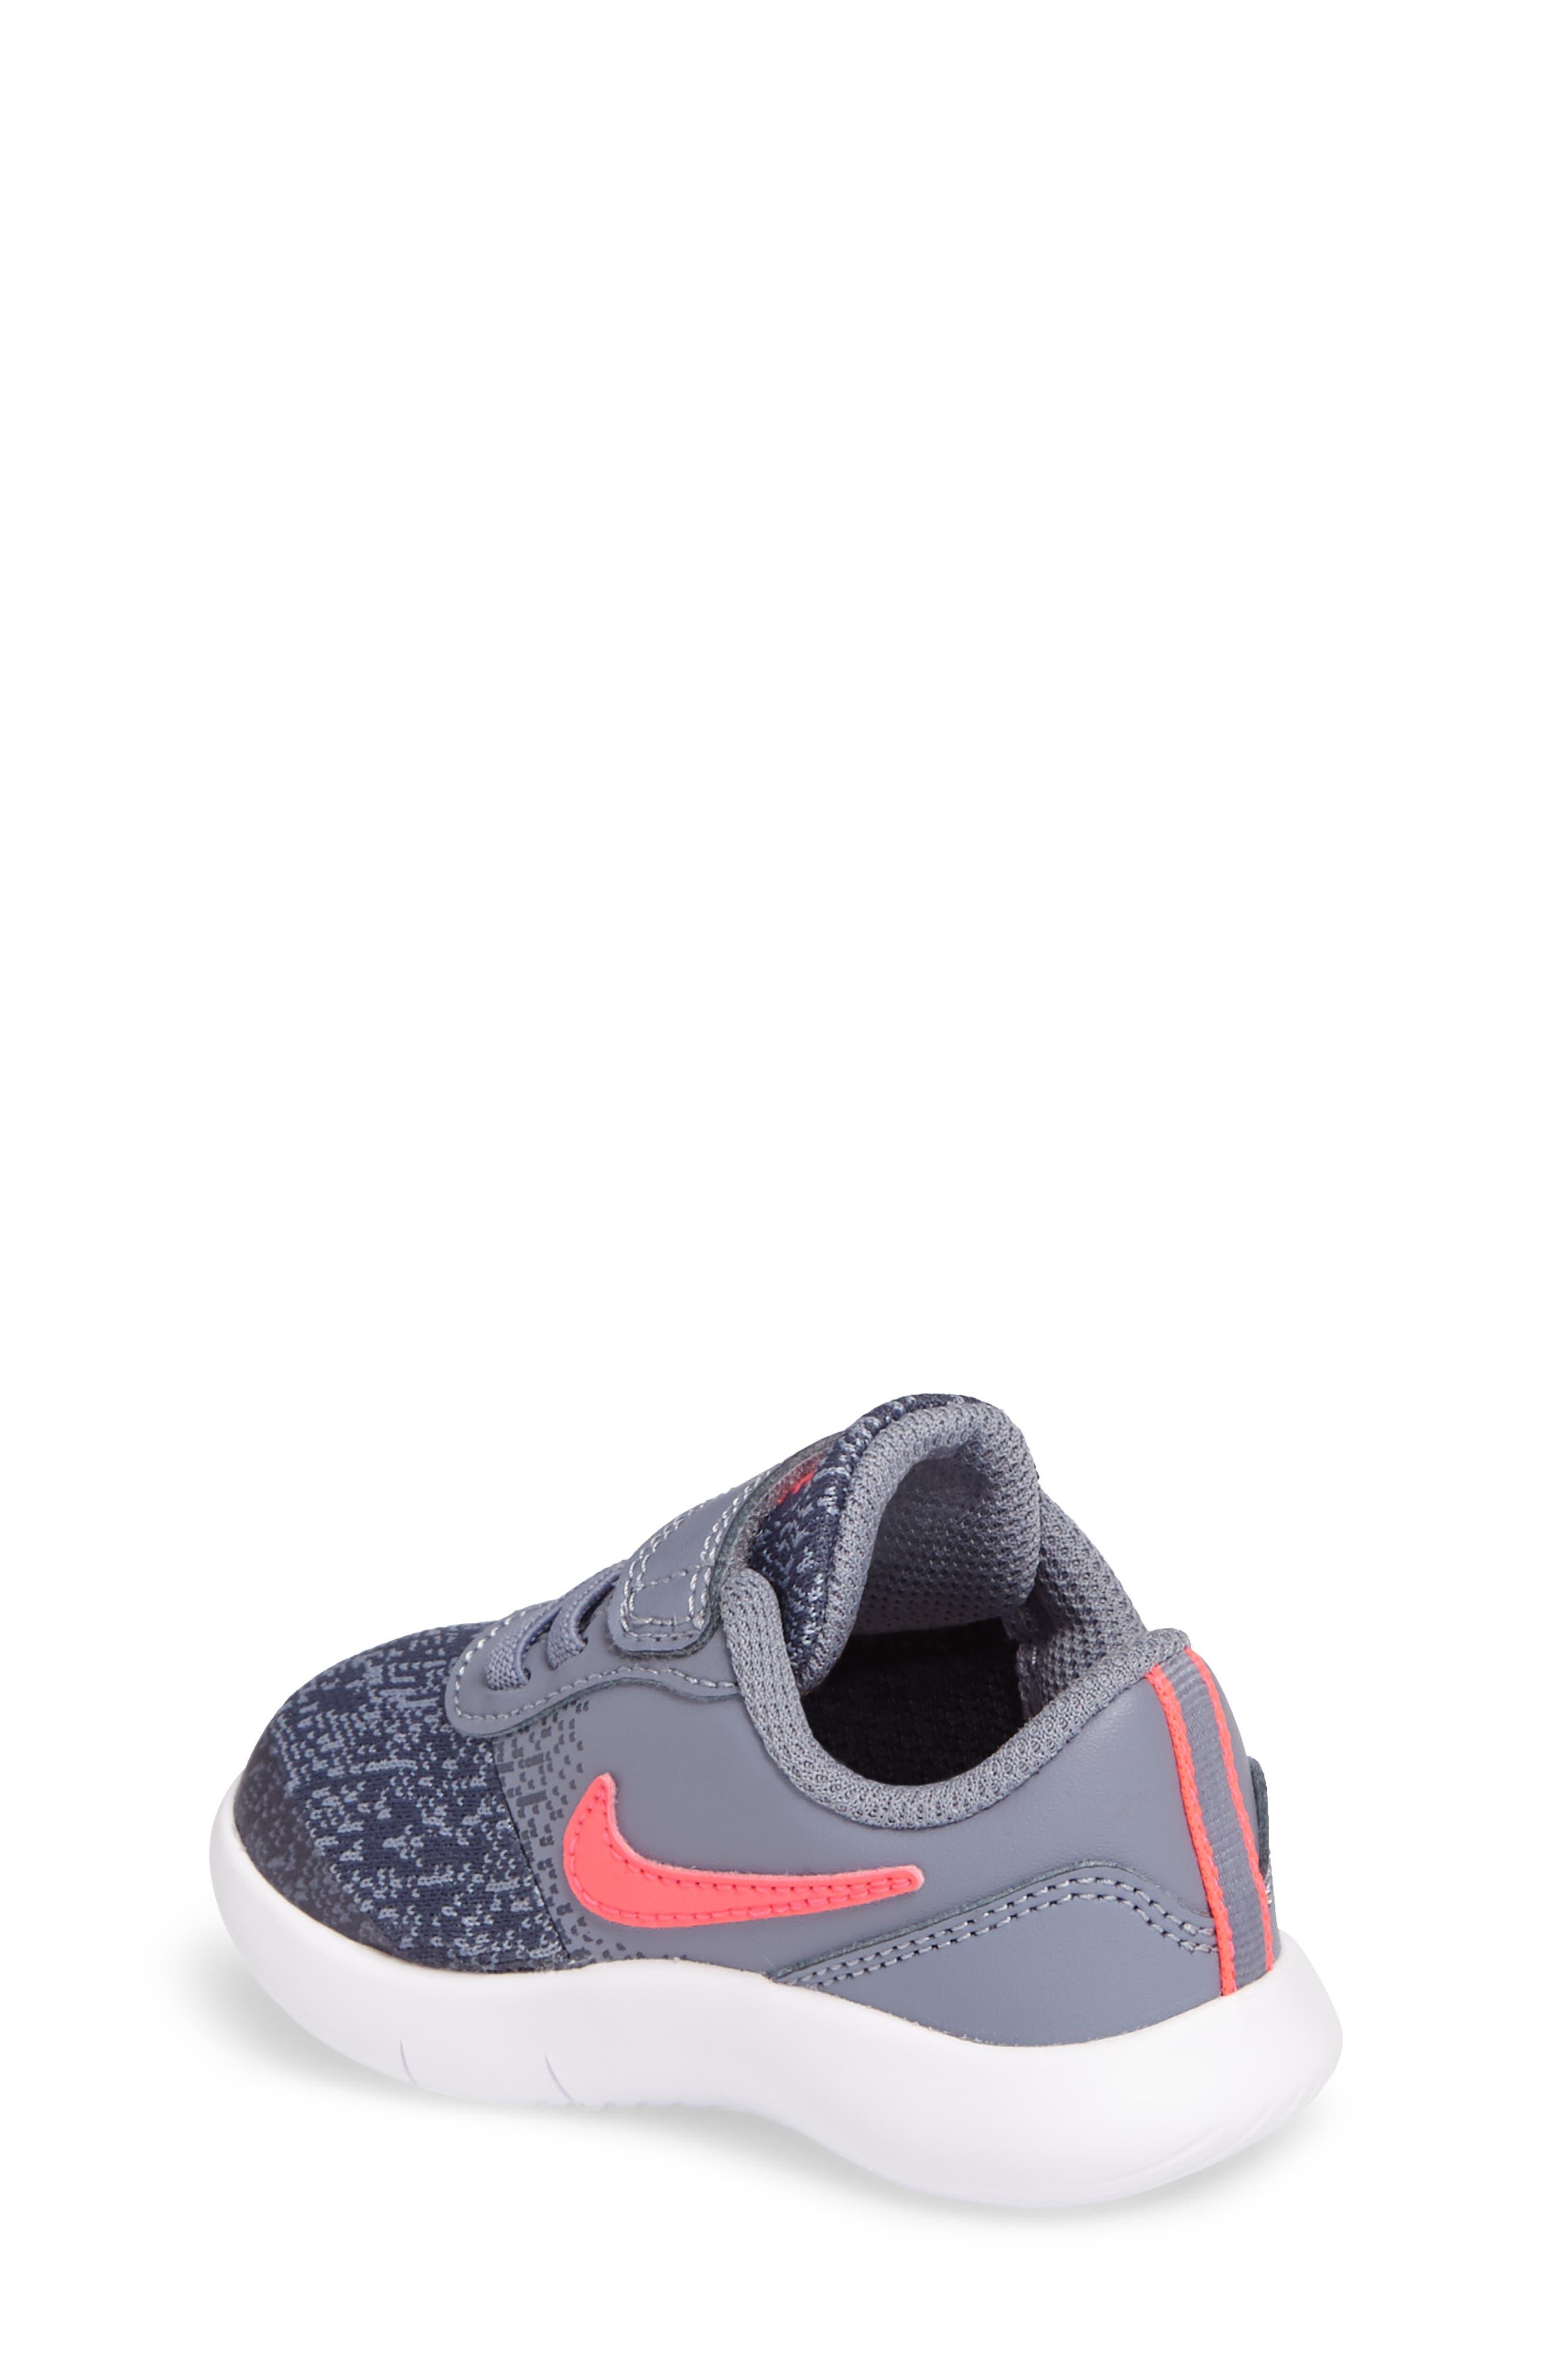 Flex Contact Sneaker,                             Alternate thumbnail 2, color,                             Racer Pink/ Thunder Blue